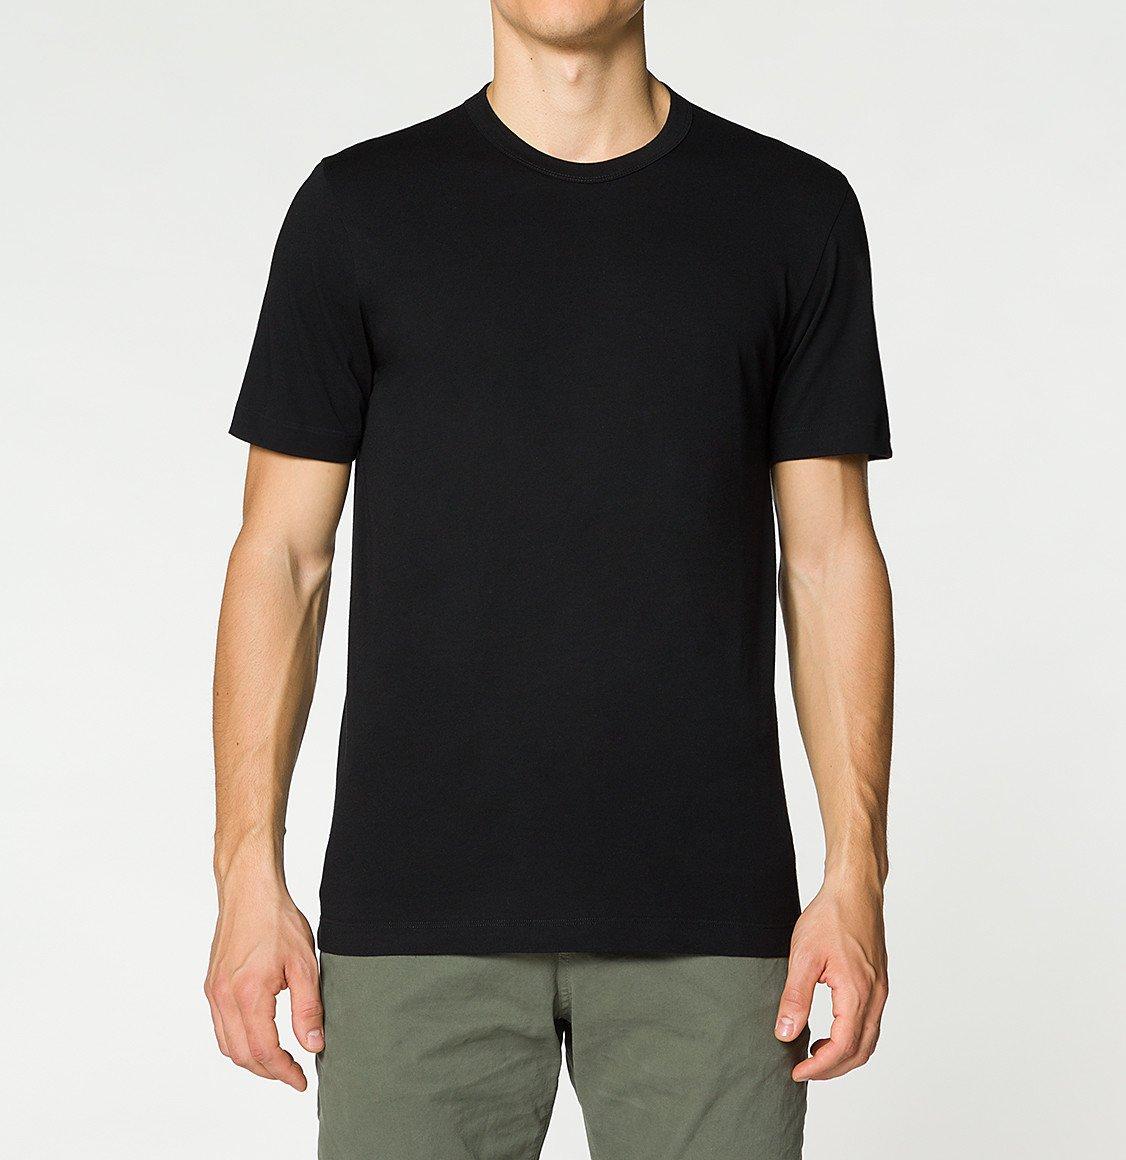 The Project Garments Crewneck Regular Fit Organic Cotton T-shirt Black